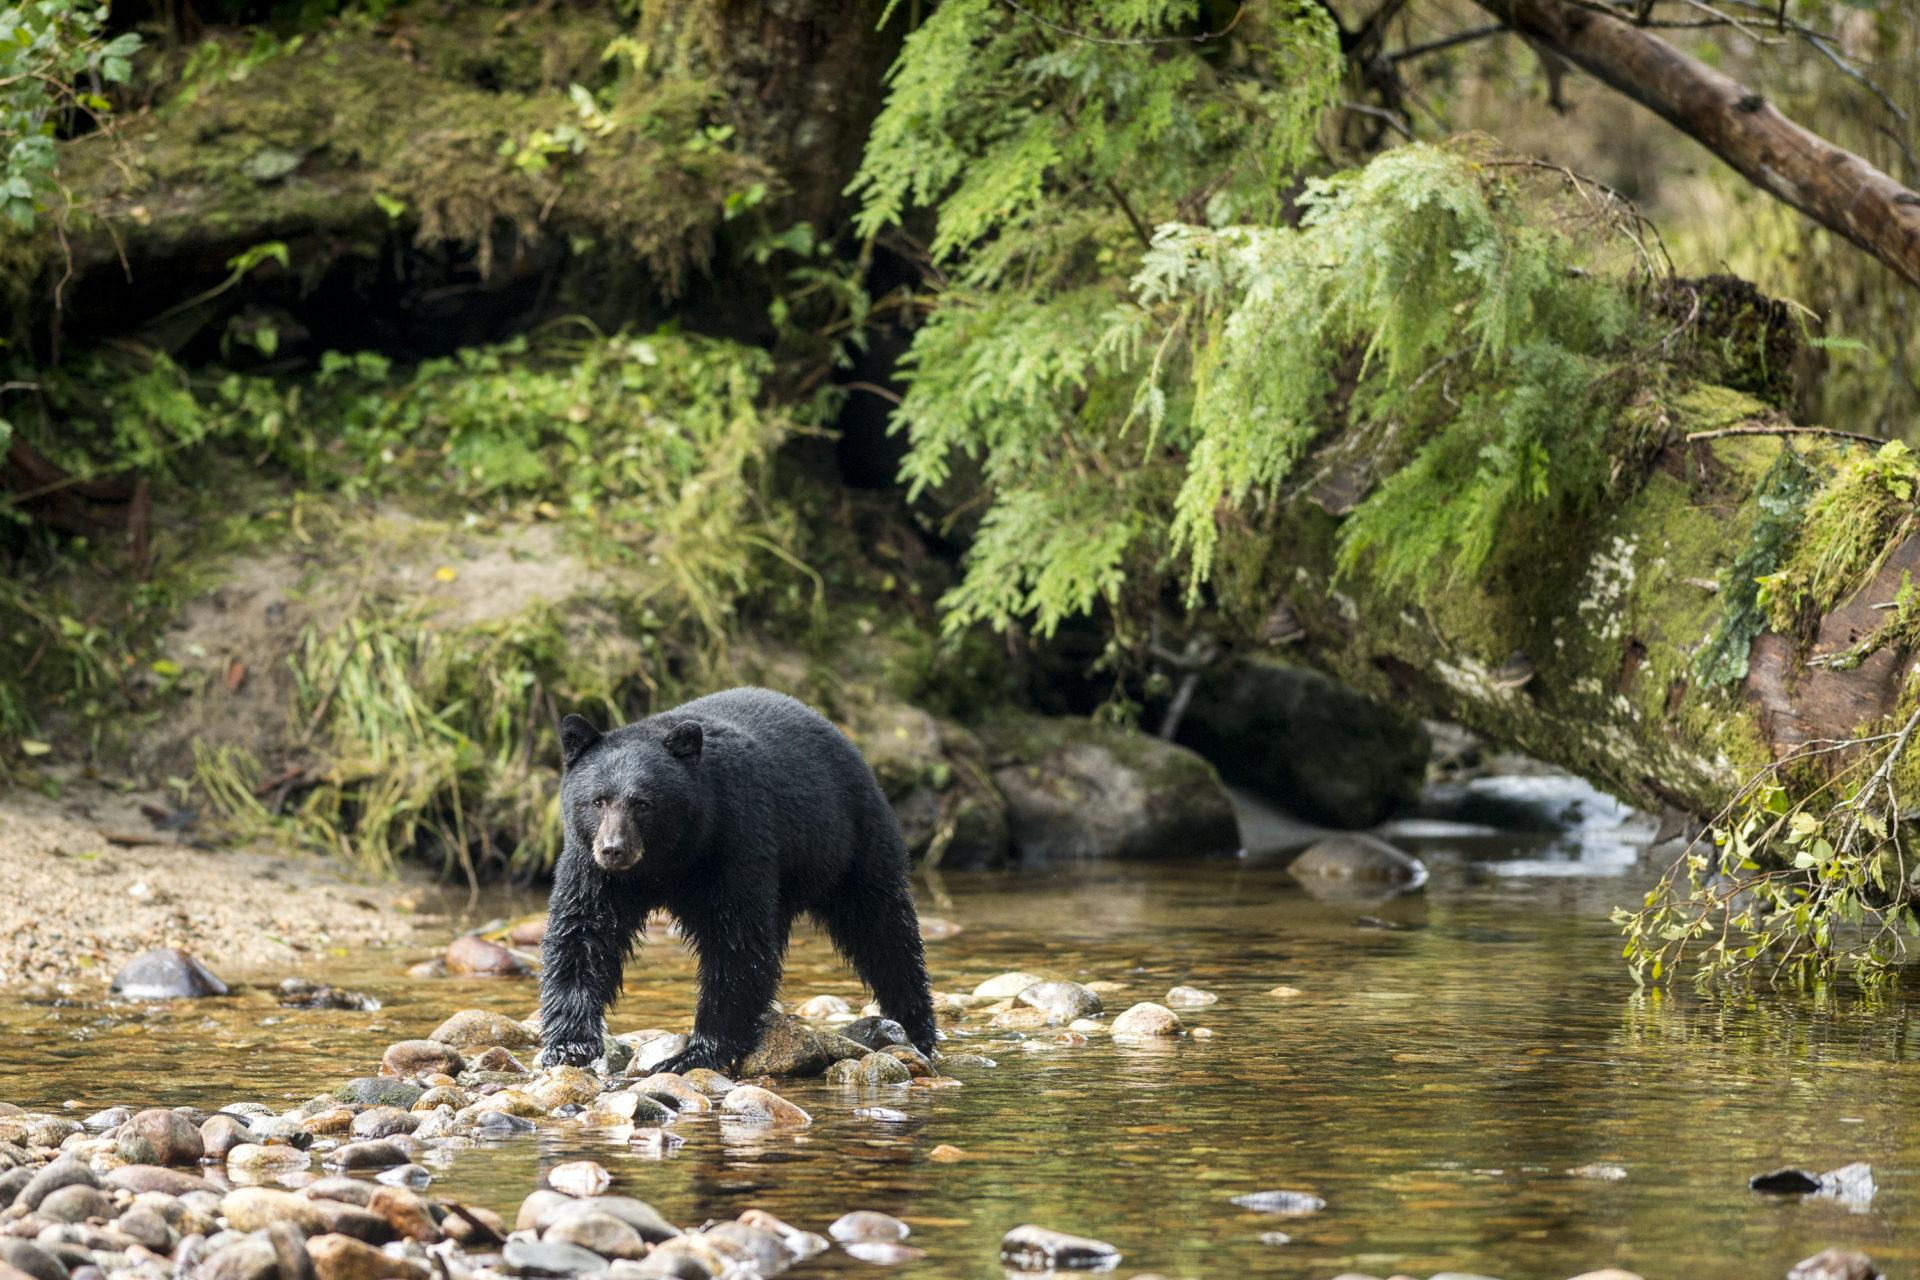 Black bear in the Great Bear Rainforest